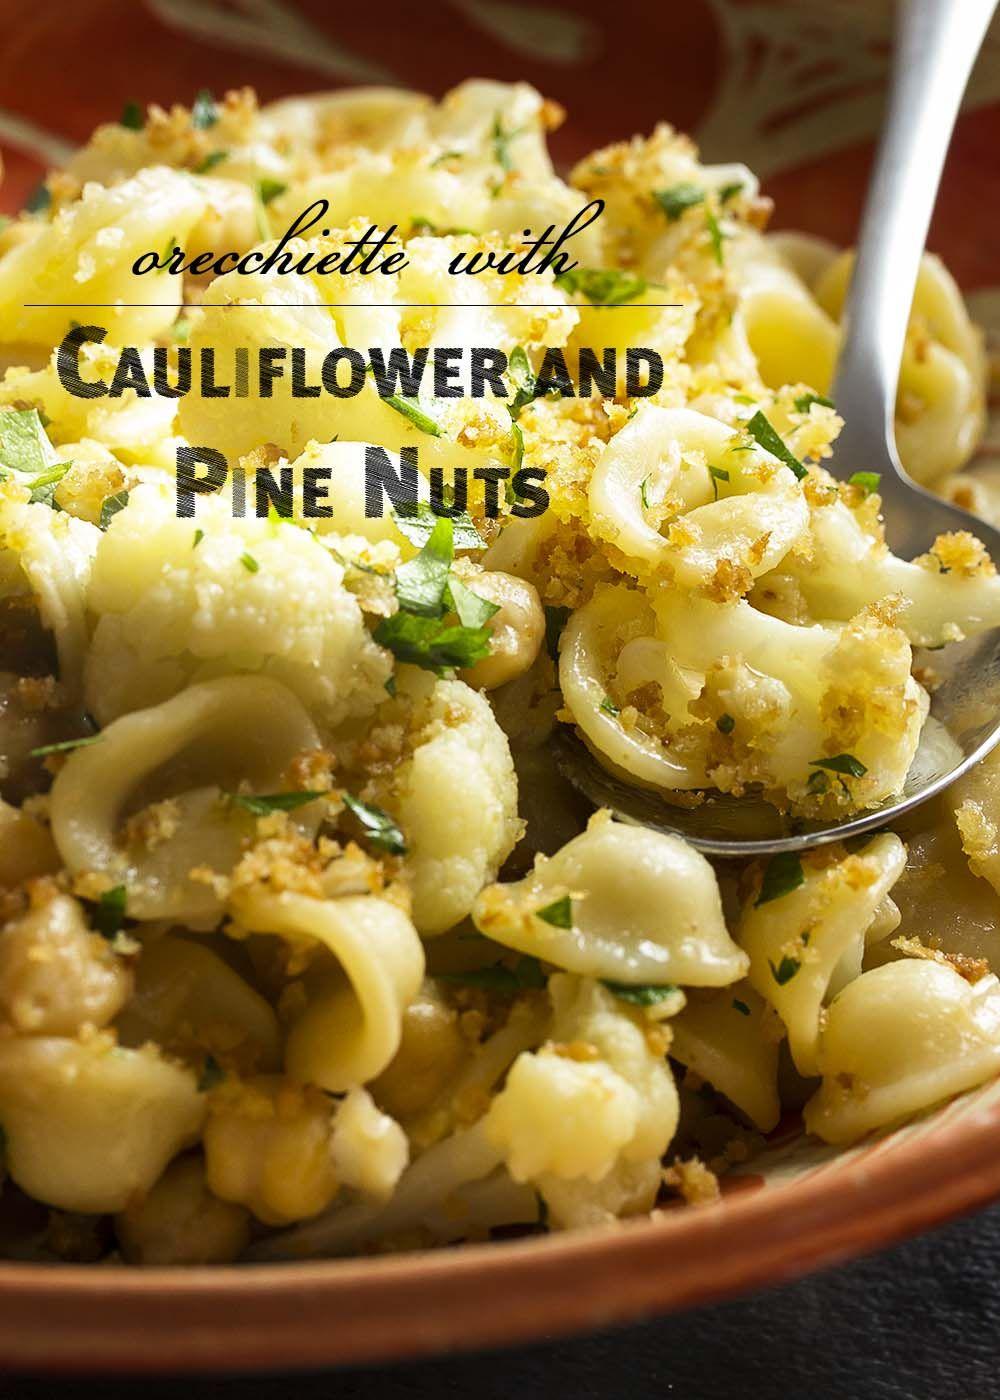 Orecchiette With Cauliflower And Pine Nuts Recipe Cauliflower